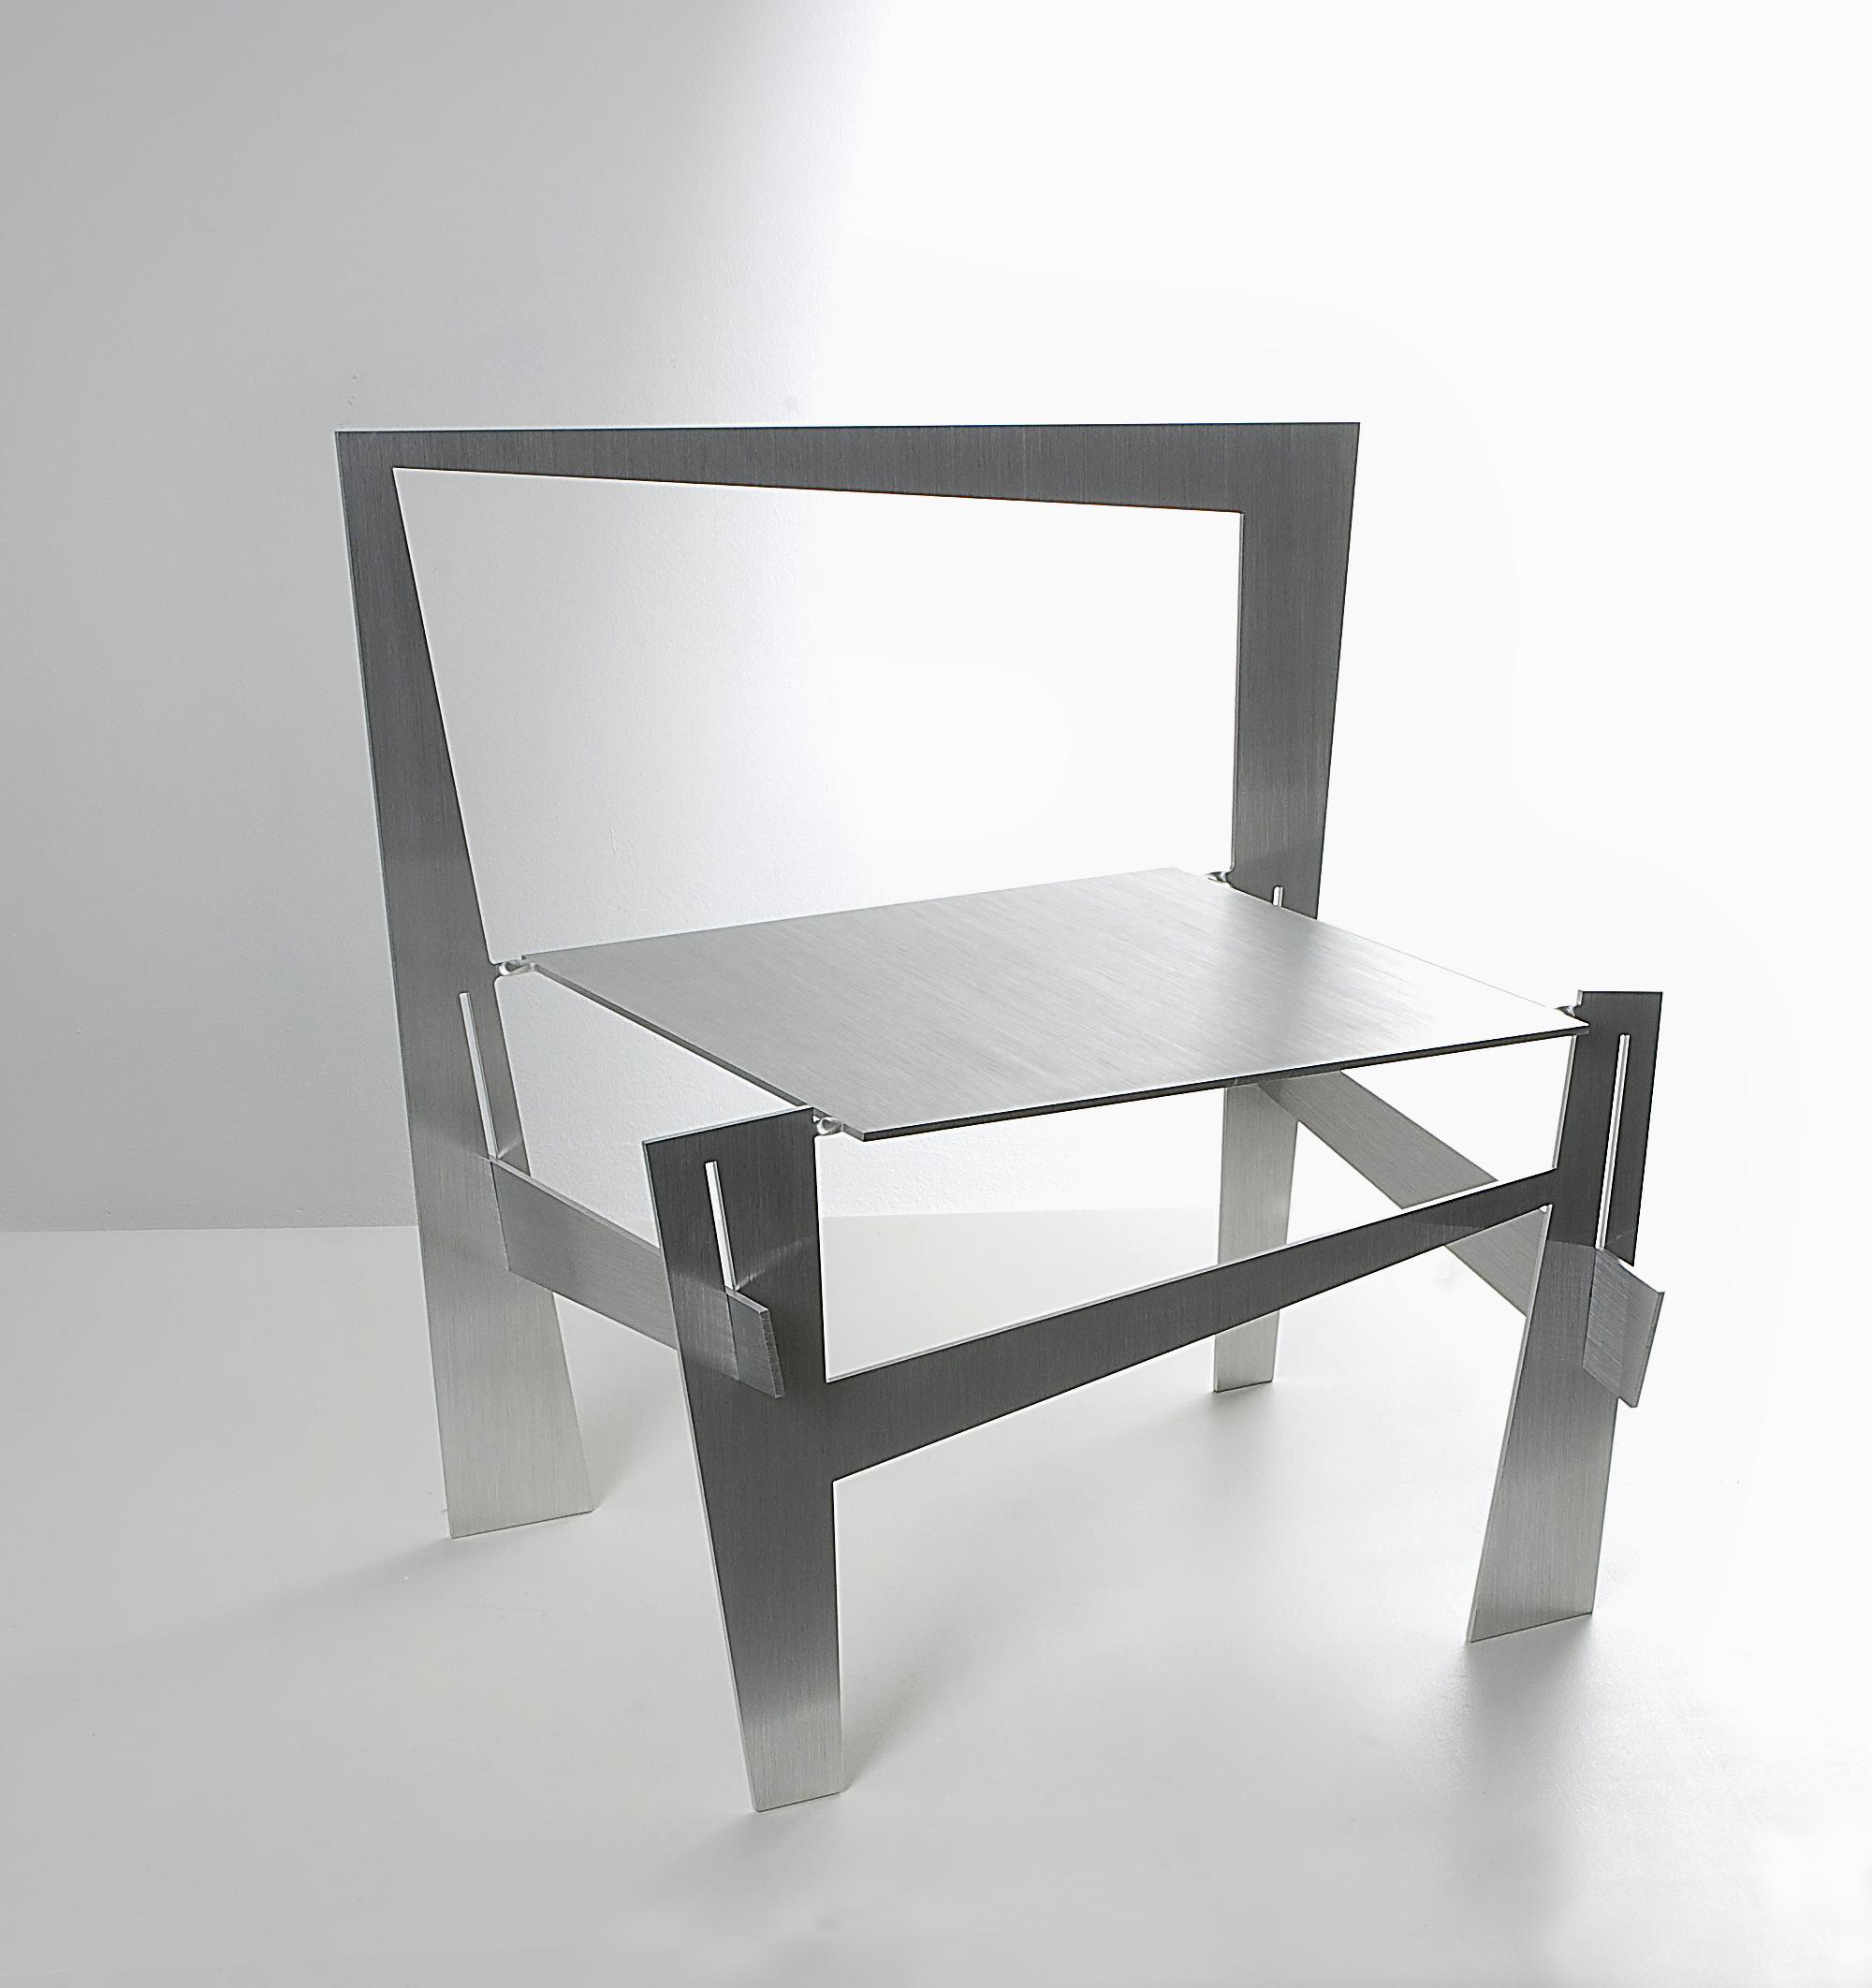 Kadushin-Vague Chair 1.jpg